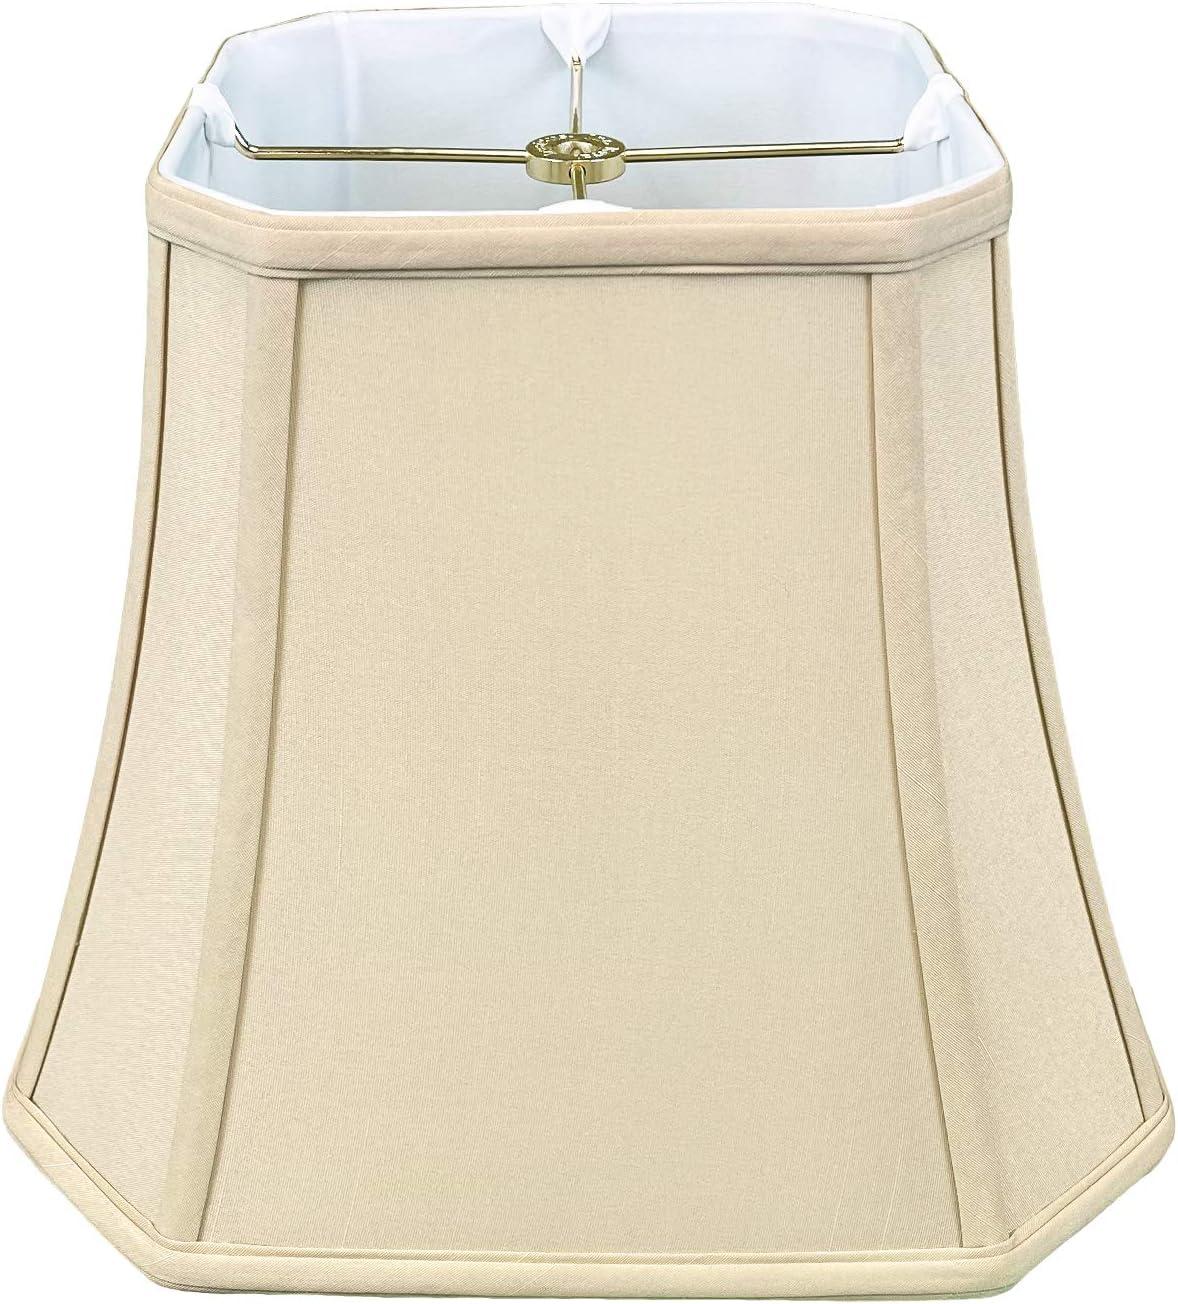 Royal Designs, Inc BSO-705-12BG Square Cut Corner Bell Lamp Shade, BSO-705, Beige